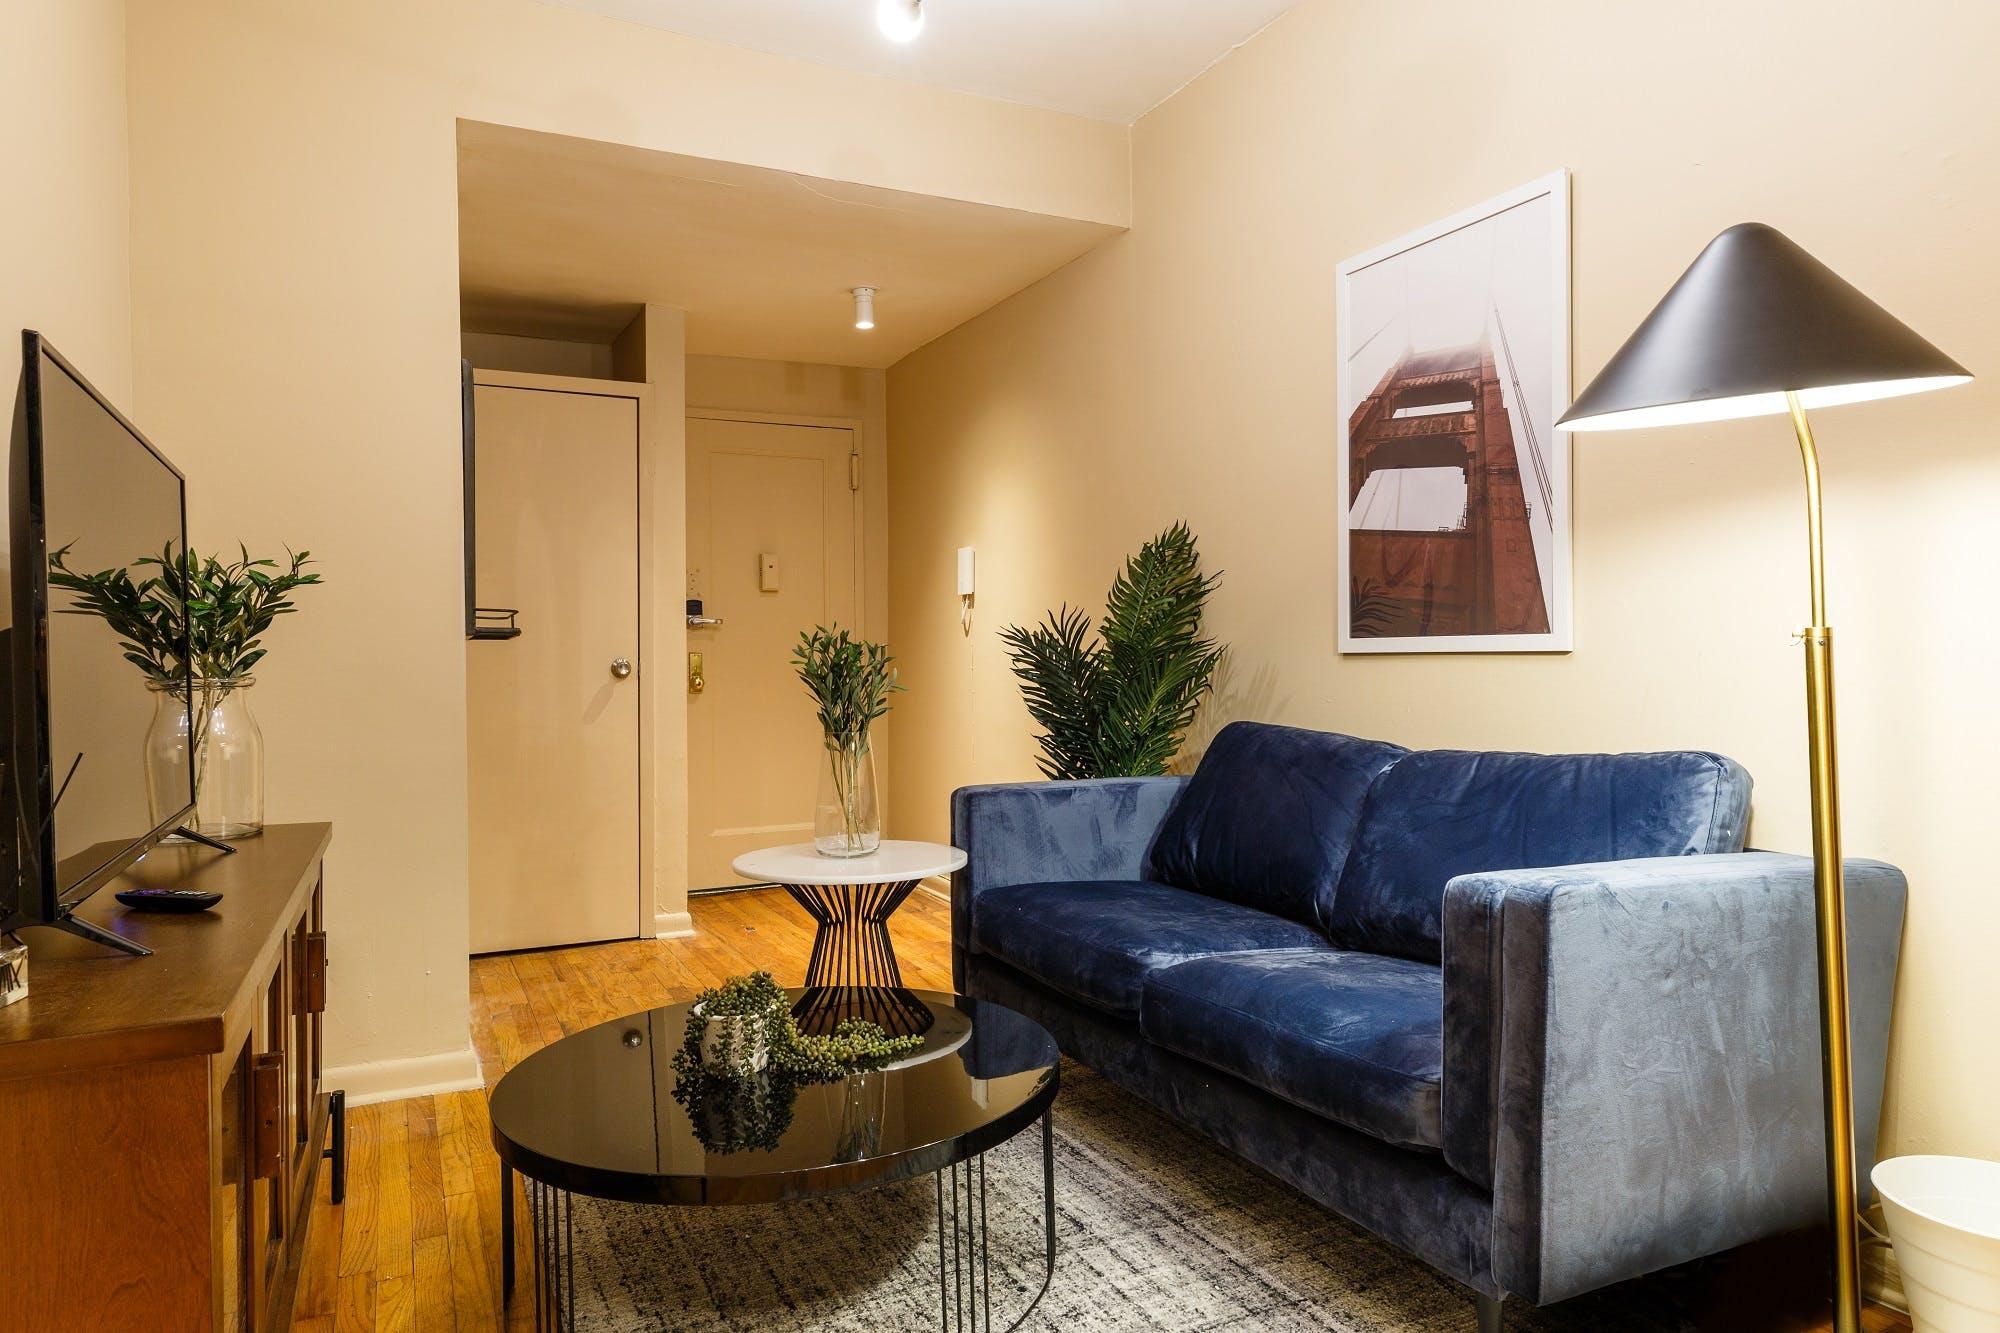 4 Residents | W 40th St. - Hudson Yards | Stunning Cozy Apt